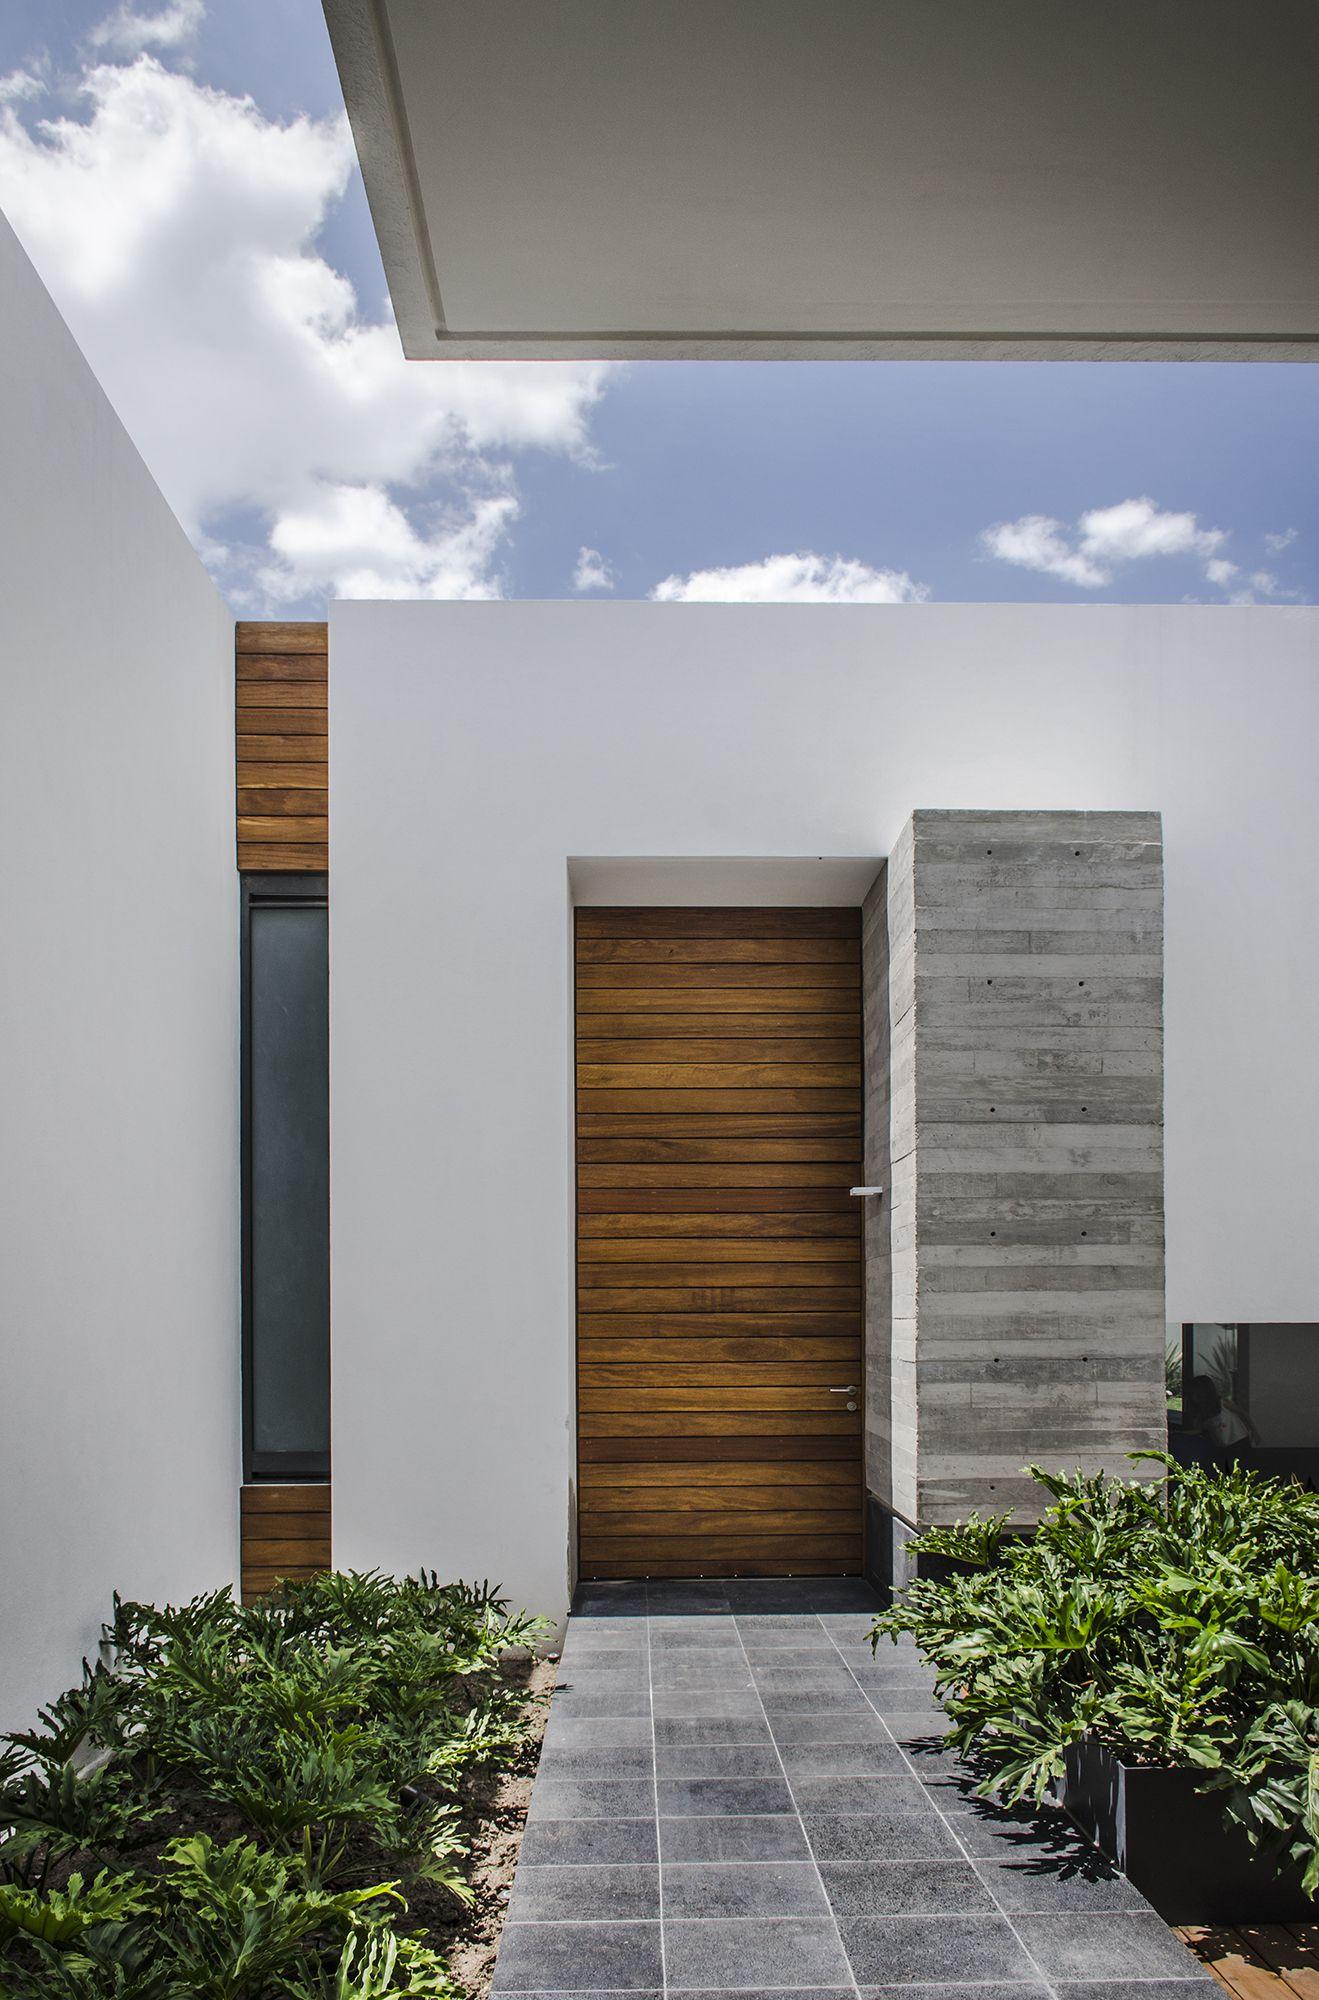 Casa bg oscar hernandez stvx productora architecture ideas